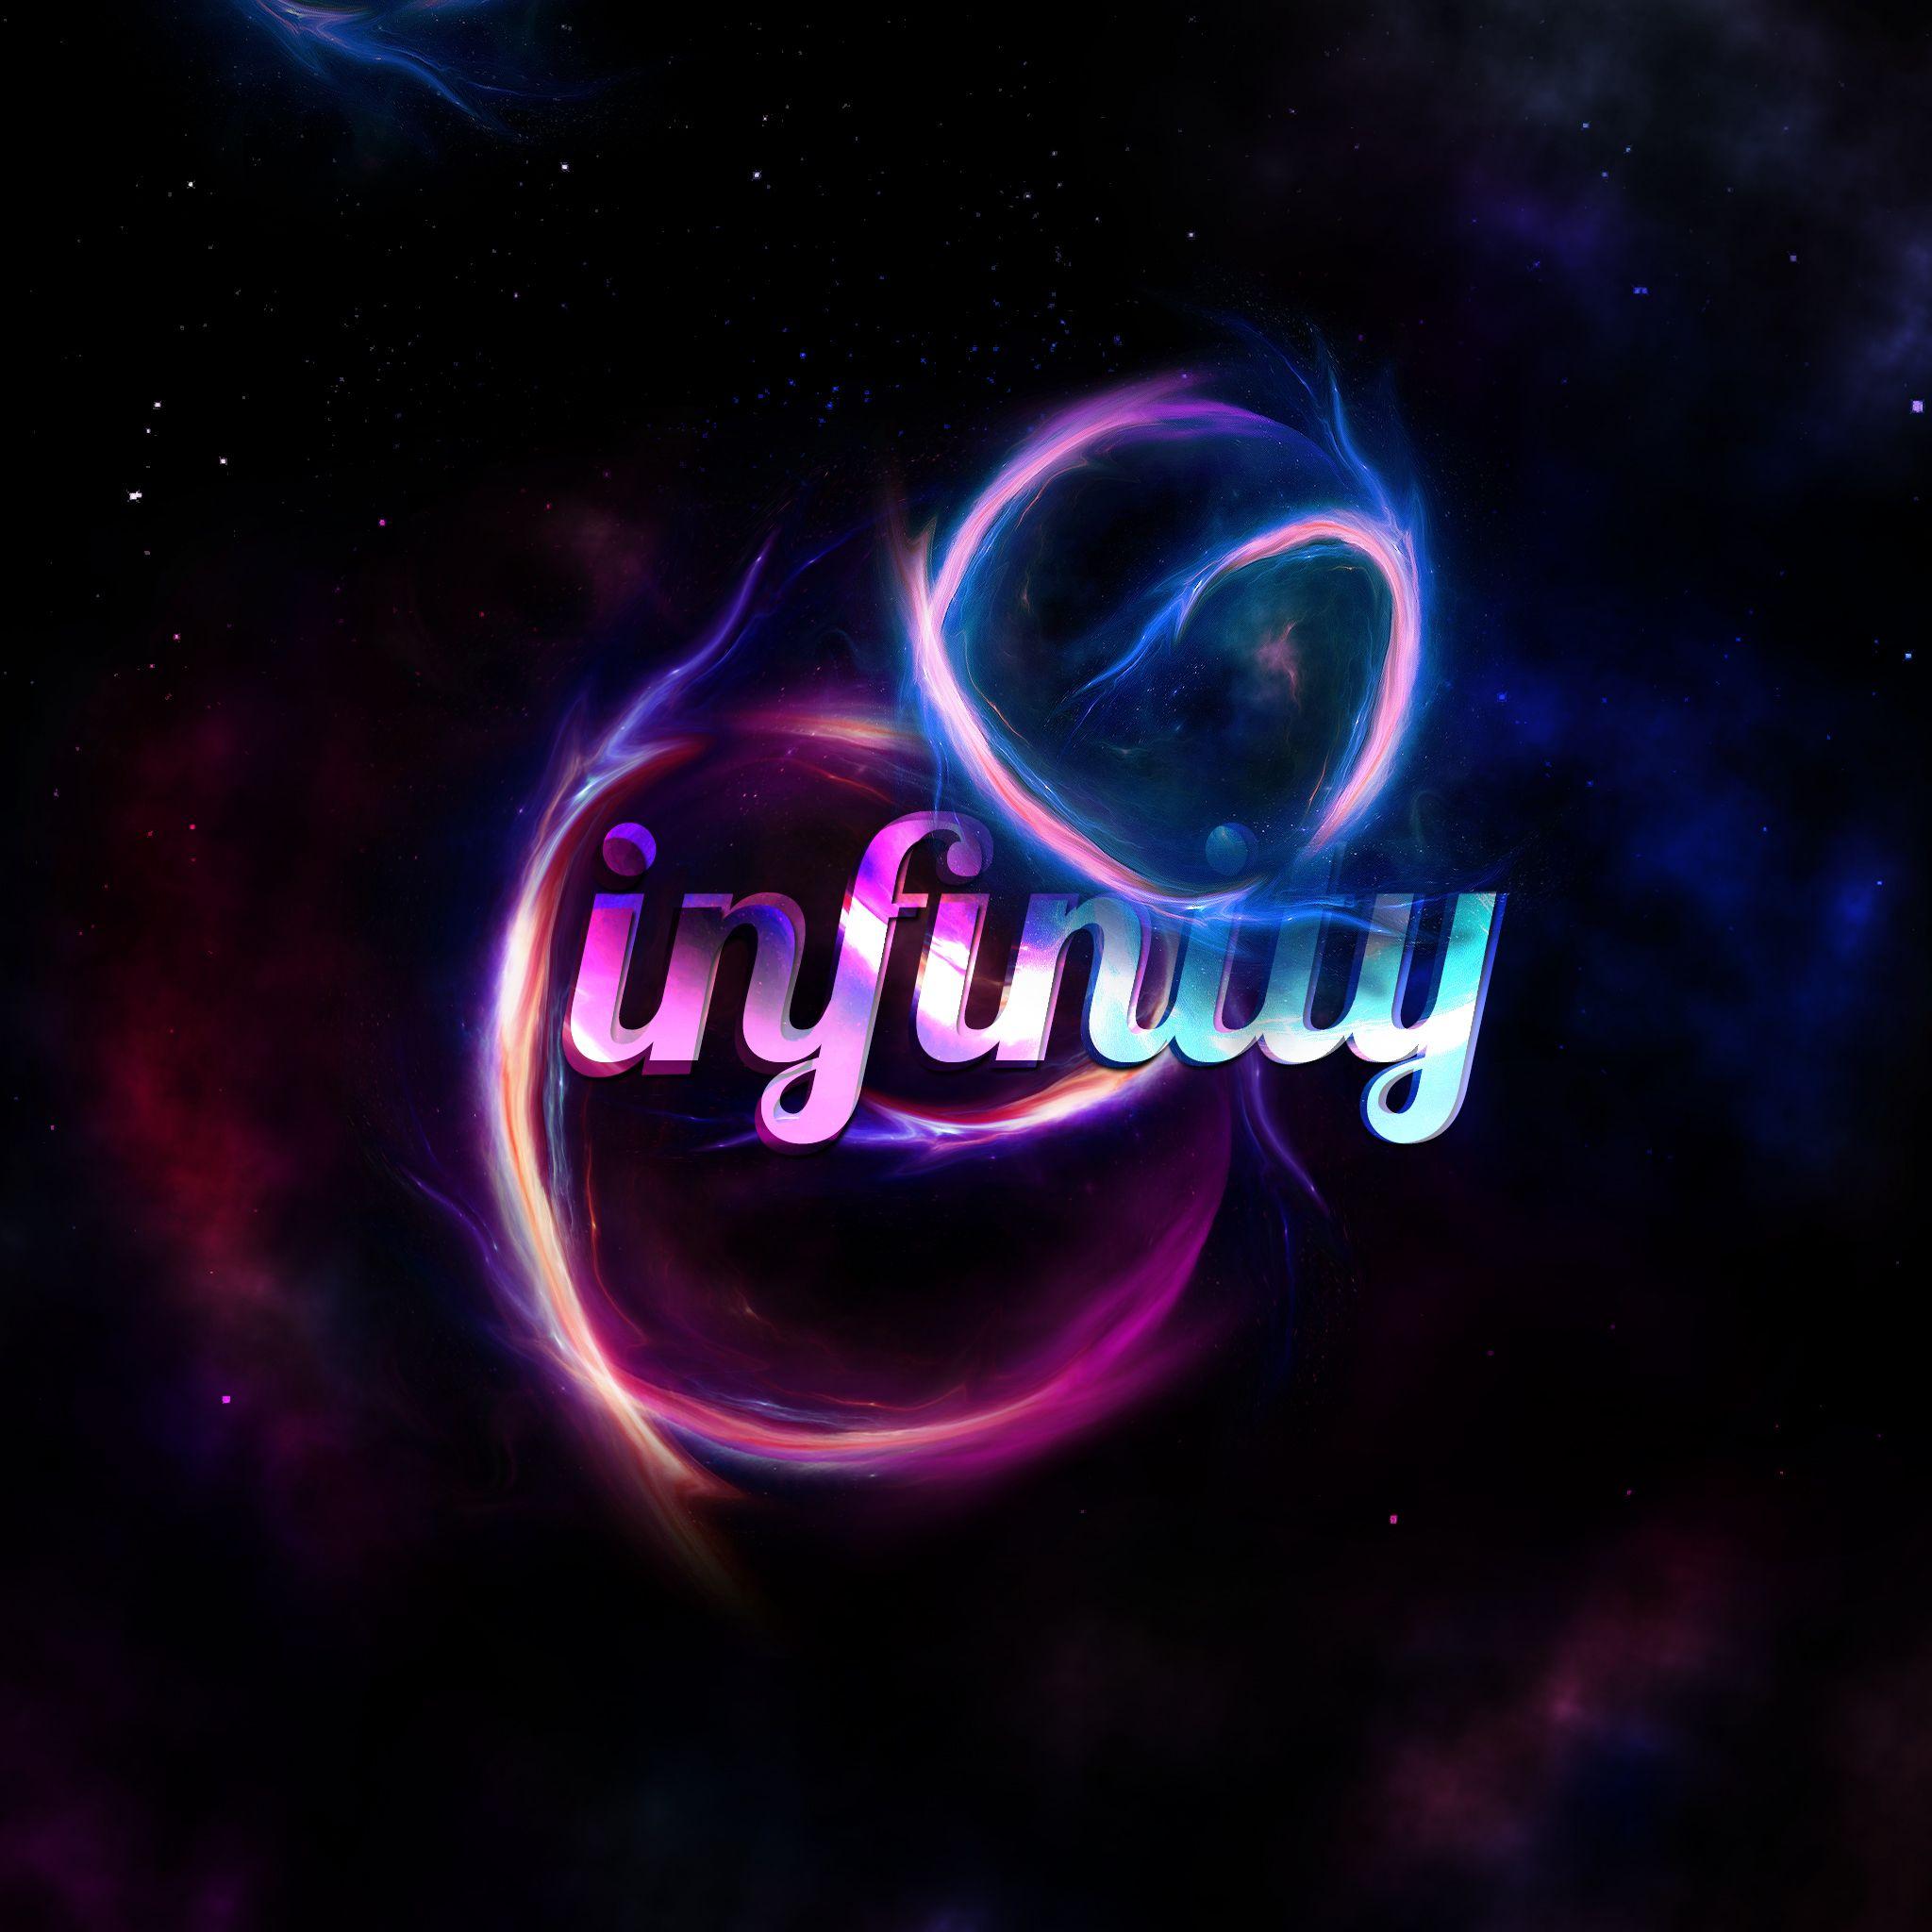 Infinity Sign Wallpaper Galaxy